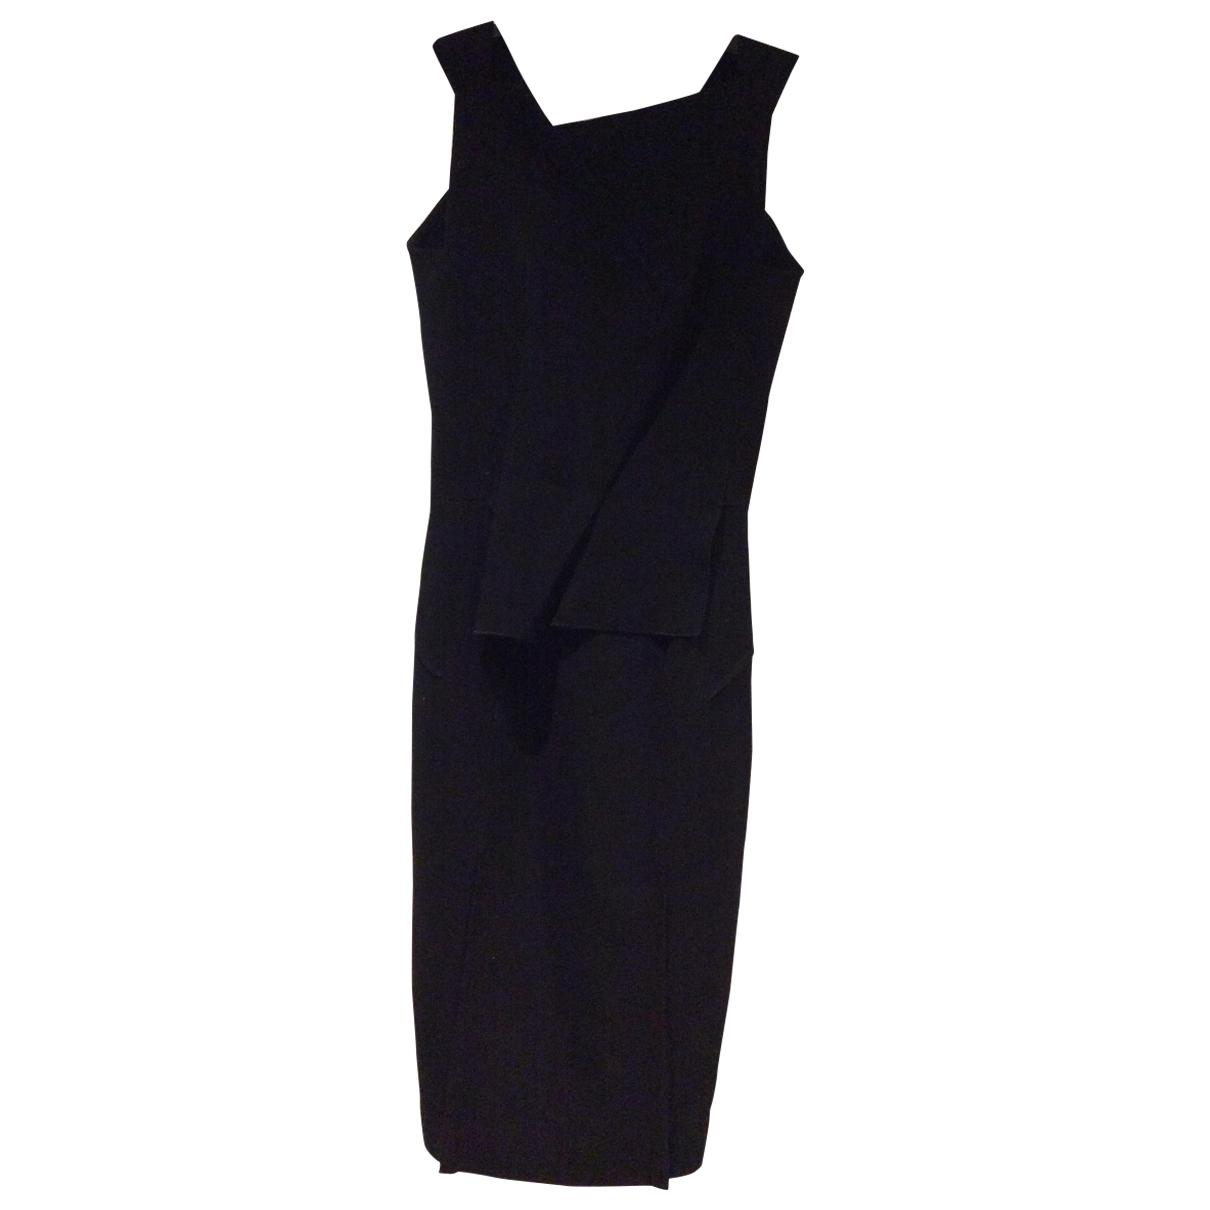 Roland Mouret \N Black Wool dress for Women 8 UK